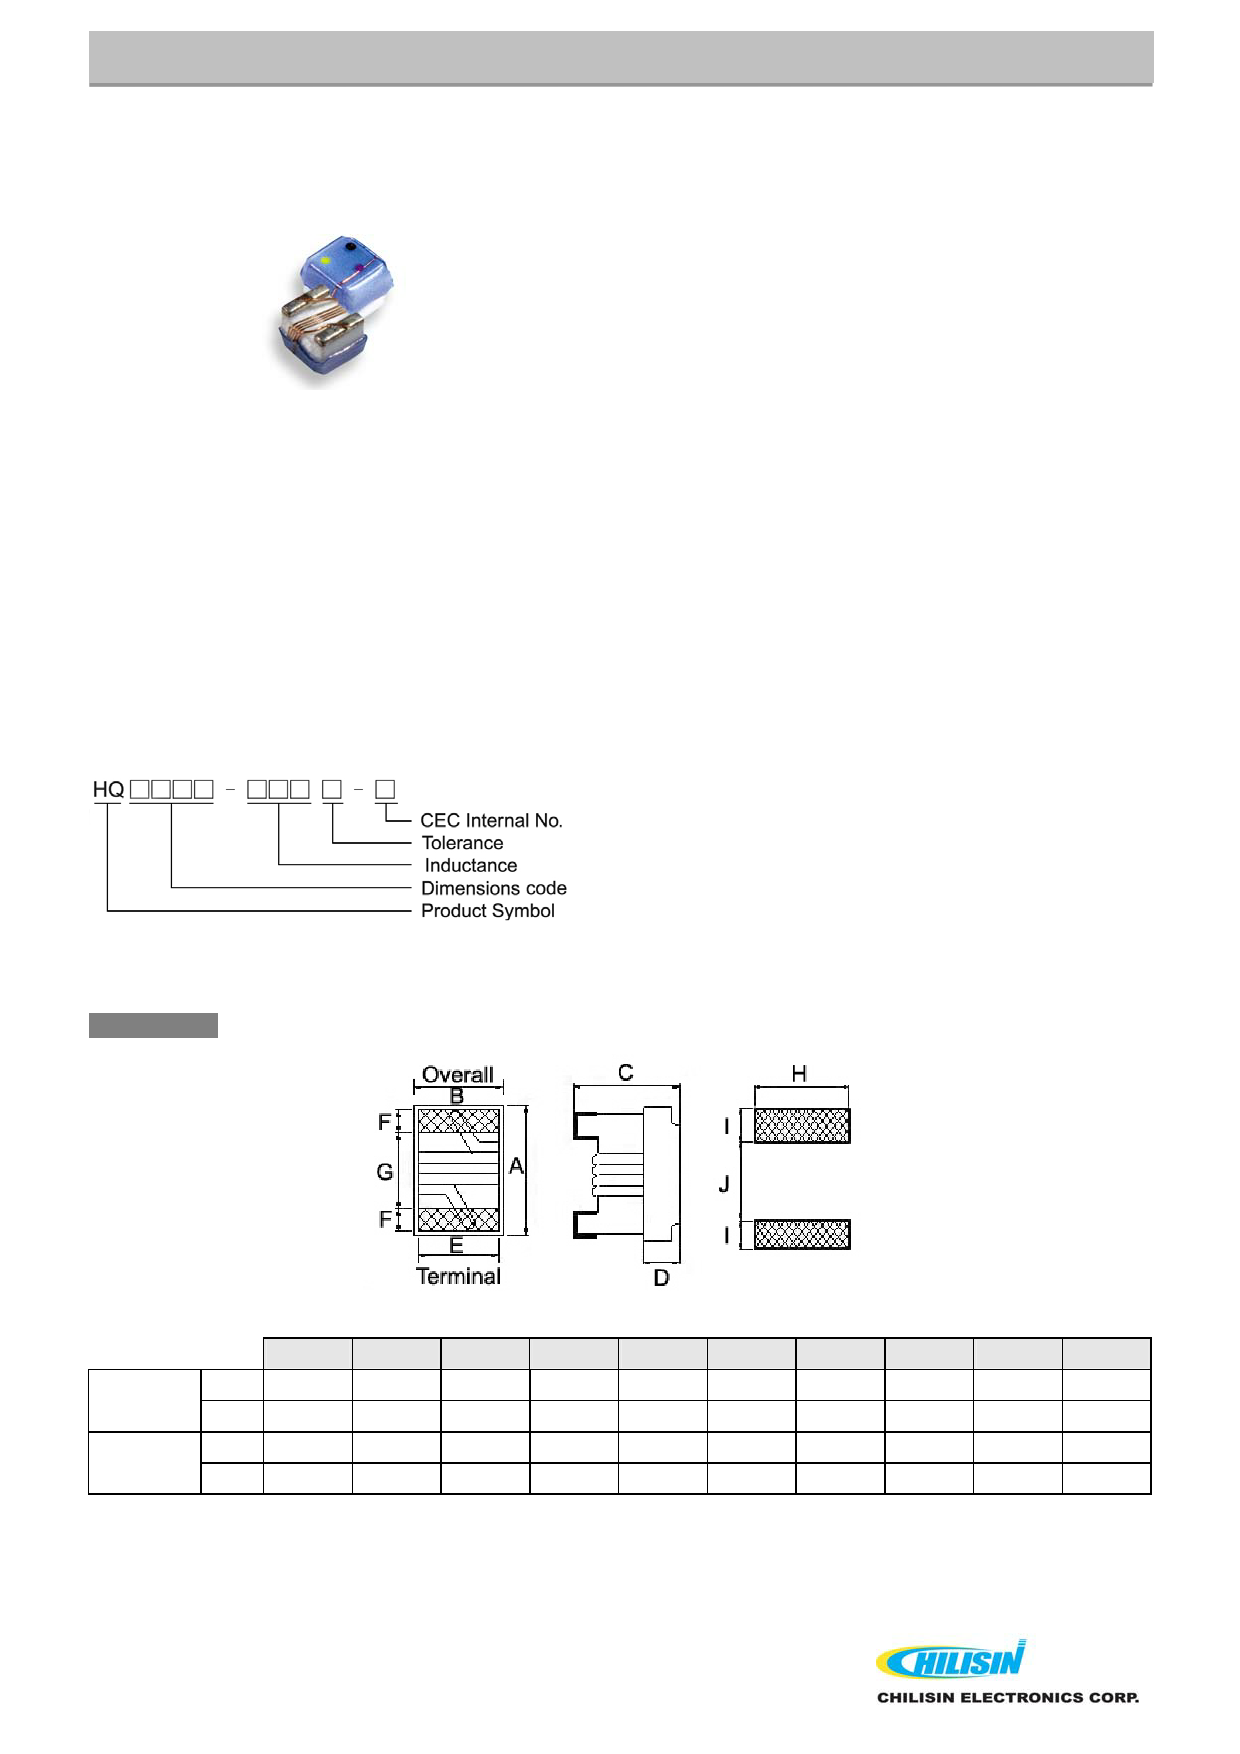 HQ1008 데이터시트 및 HQ1008 PDF